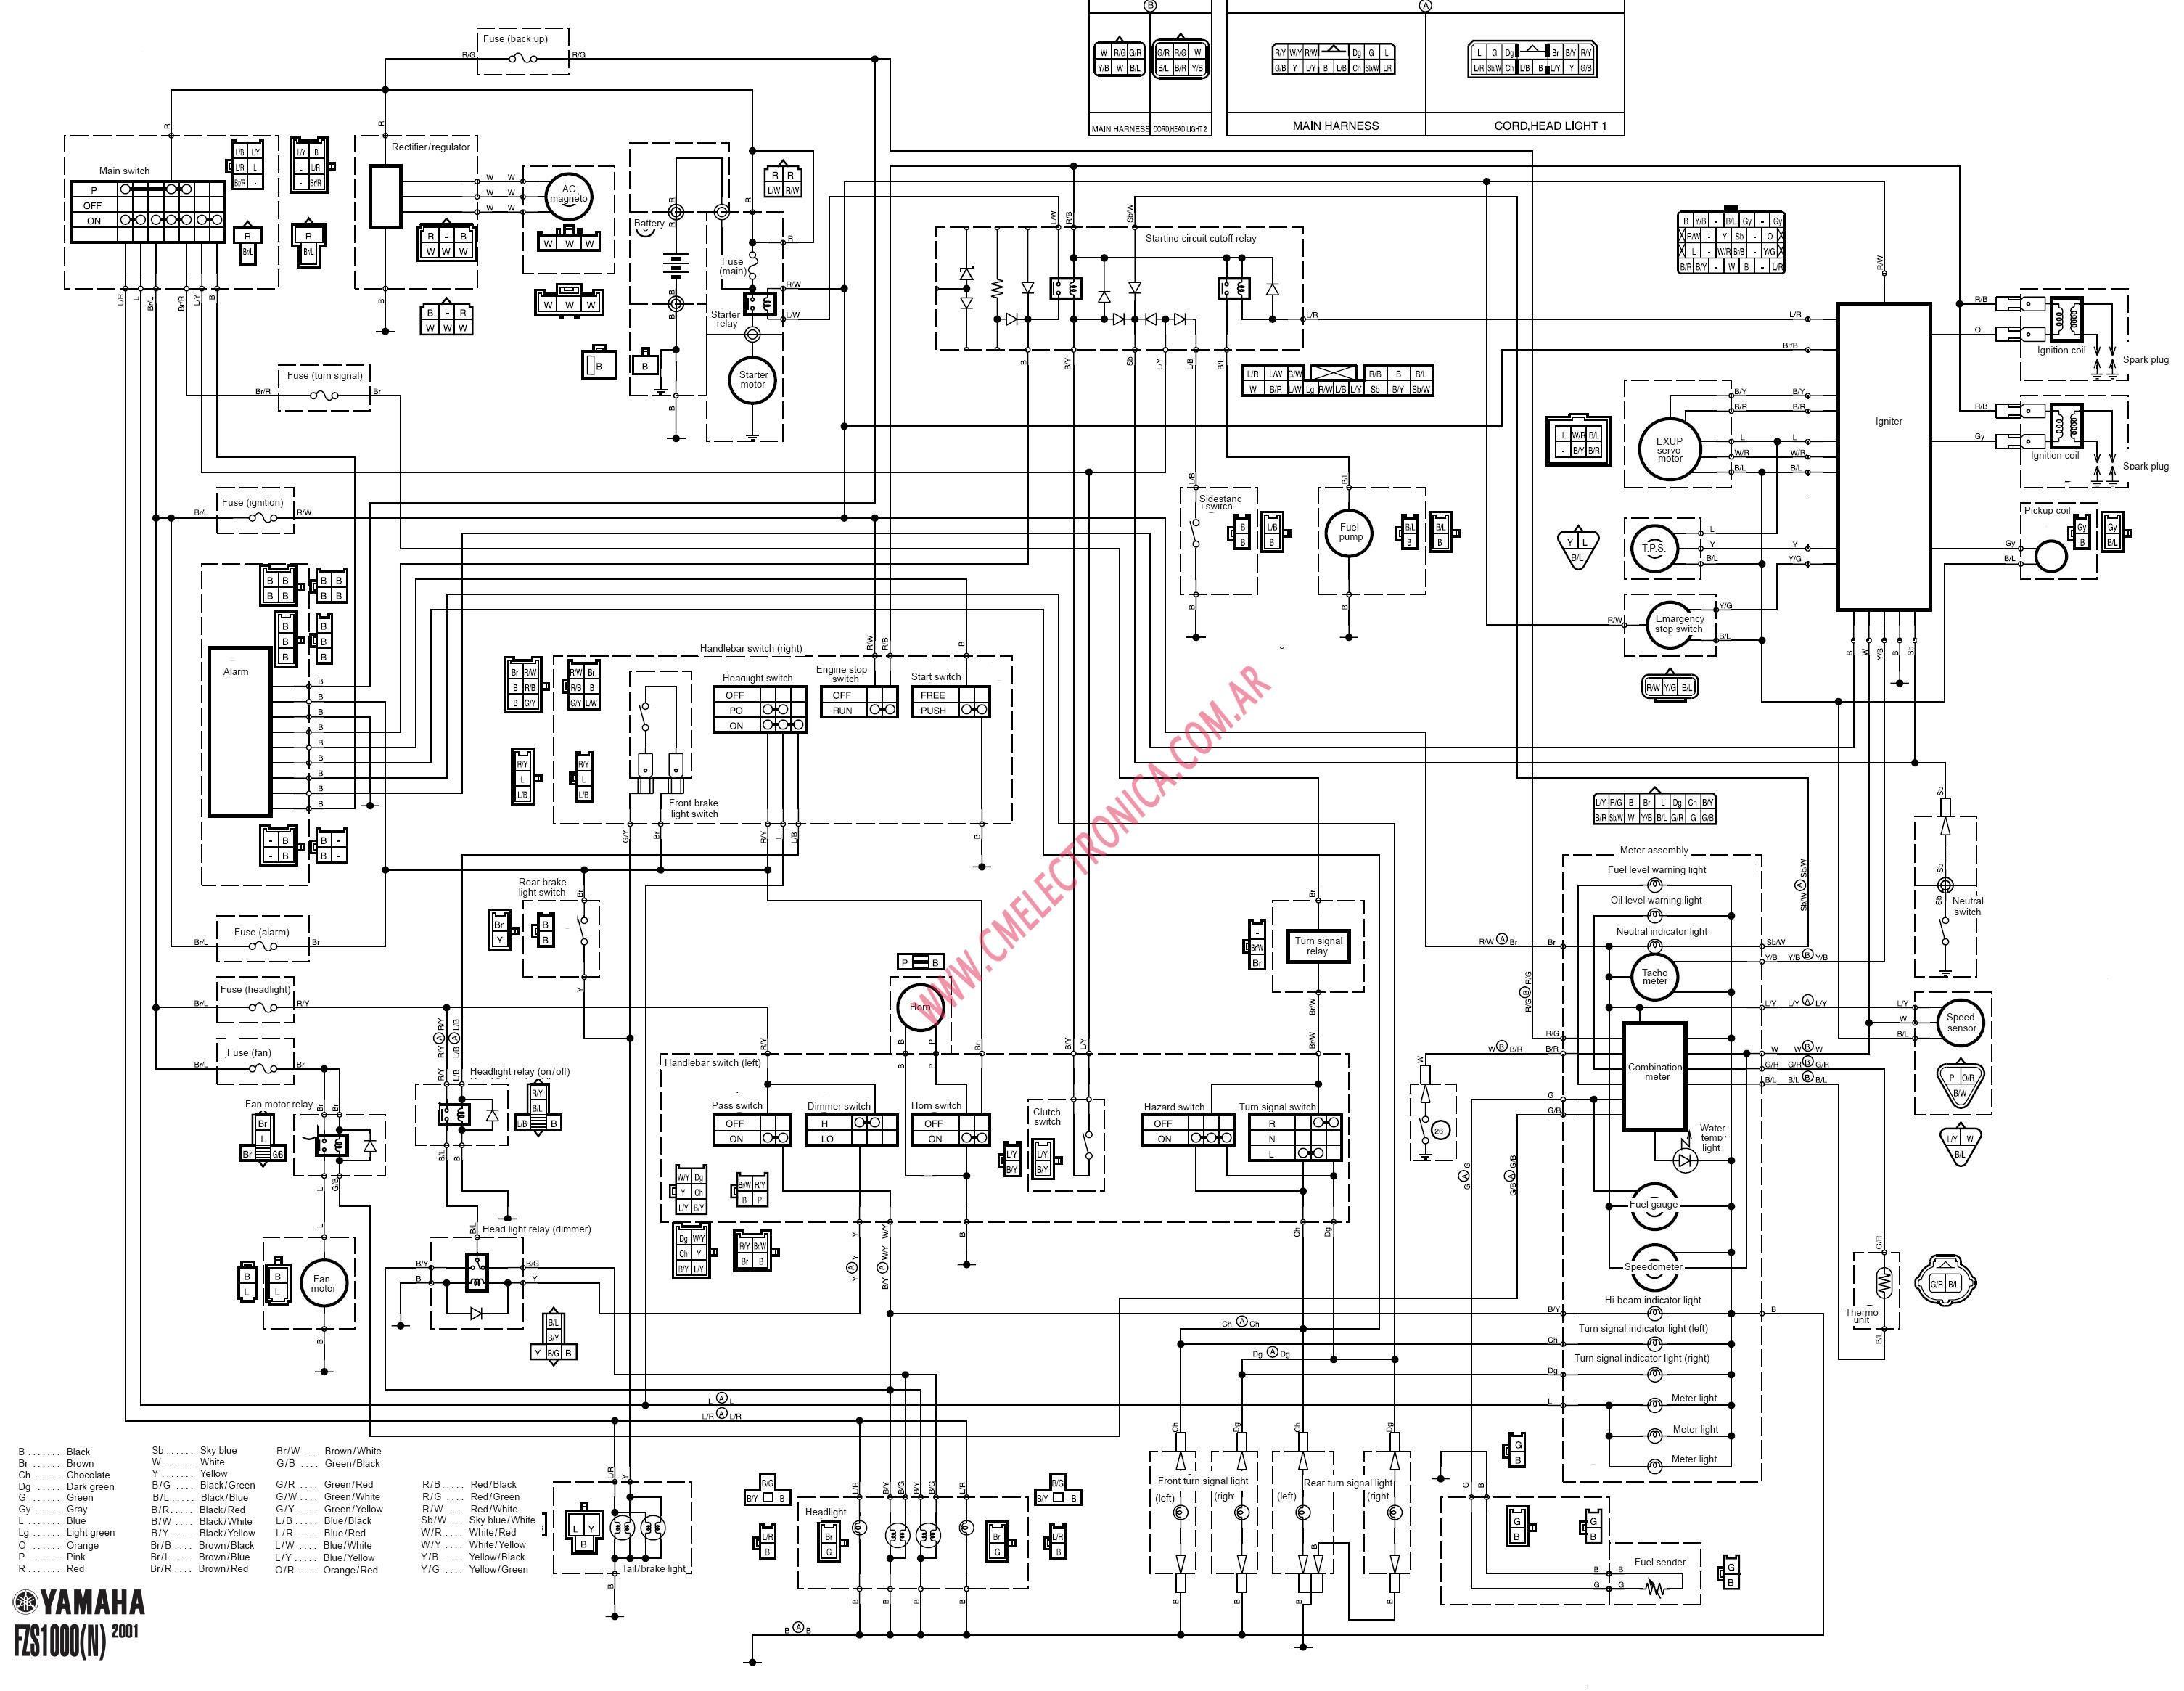 06 isuzu npr wiring diagram 06 flhr handlebars wiring diagram harley handlebar wiring diagram inspirational wiring #8